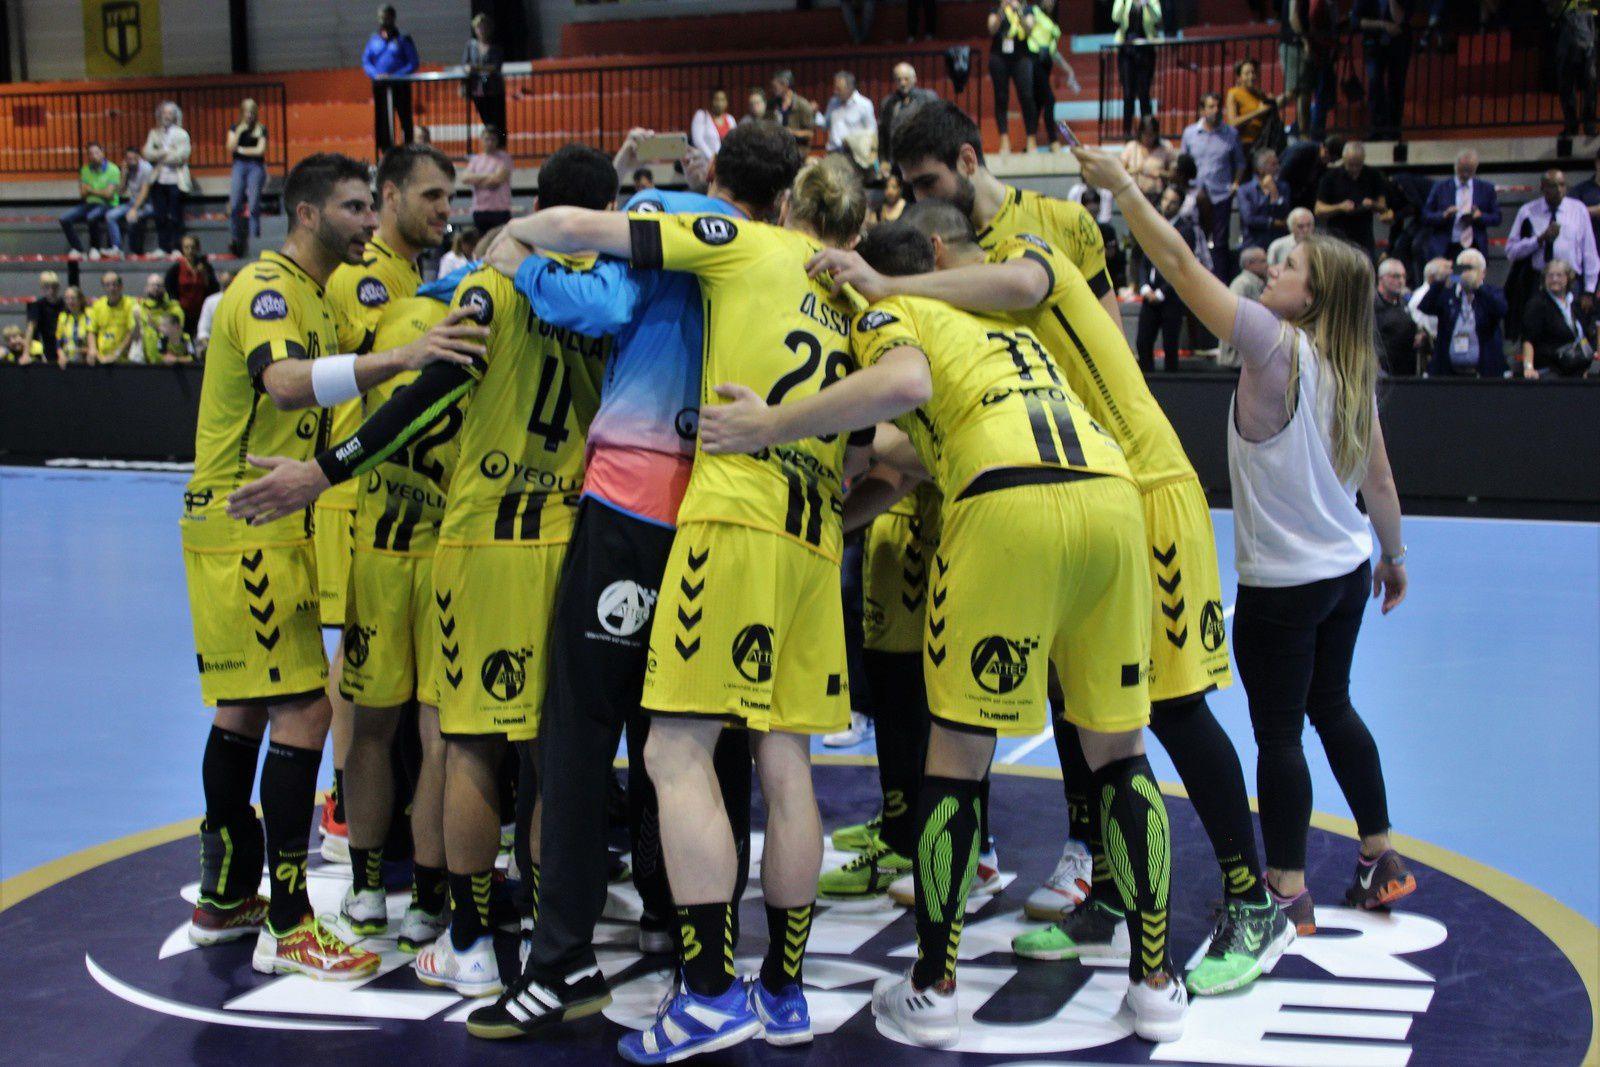 TFHB vs Pays Aix UC (LSL - 19.09.2018)